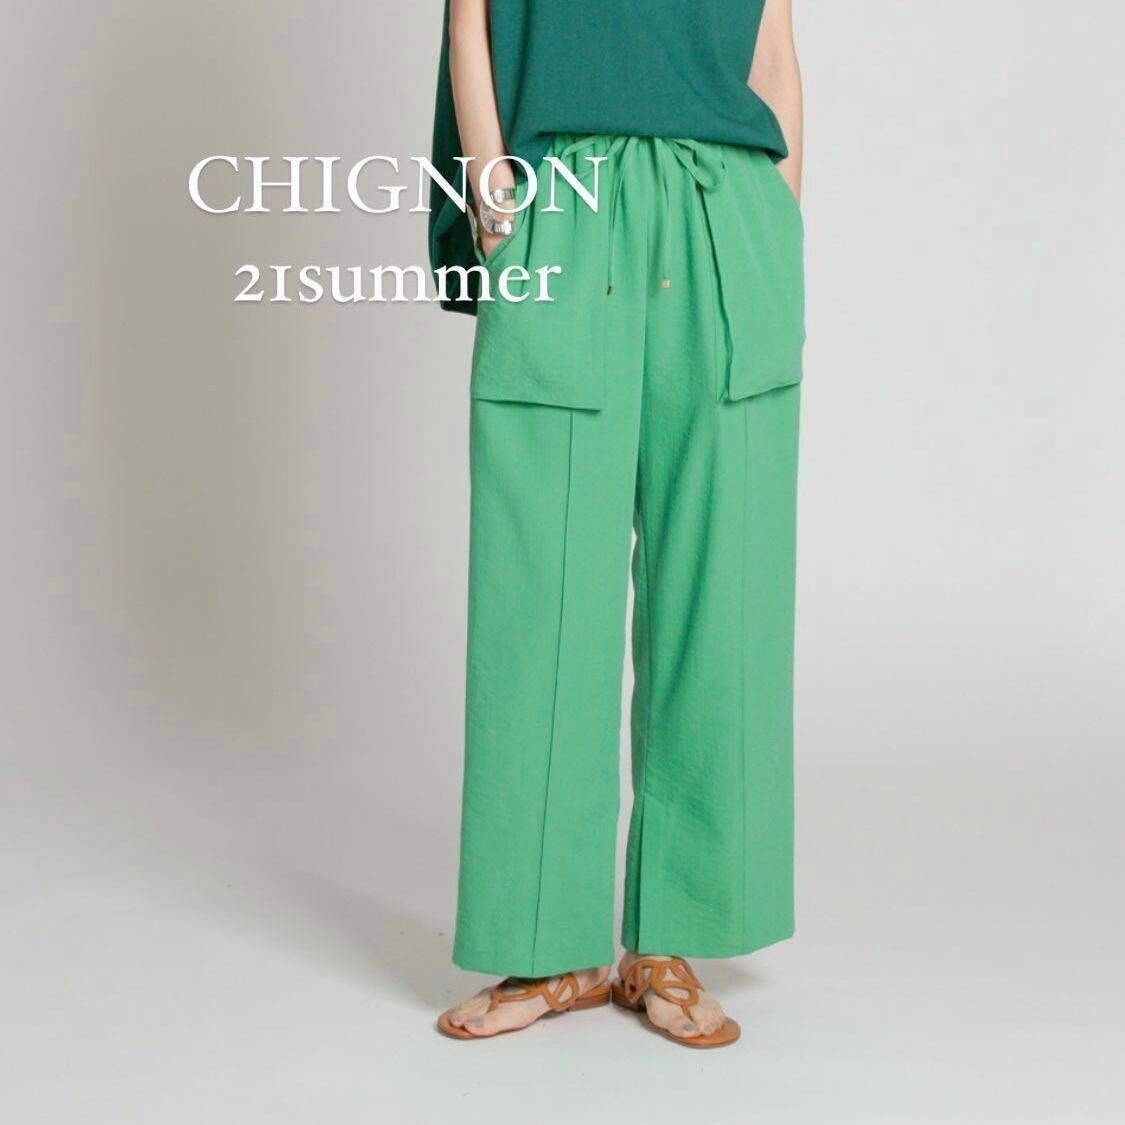 【 chignon 】- 1611-437 - ベイカーイージーパンツ